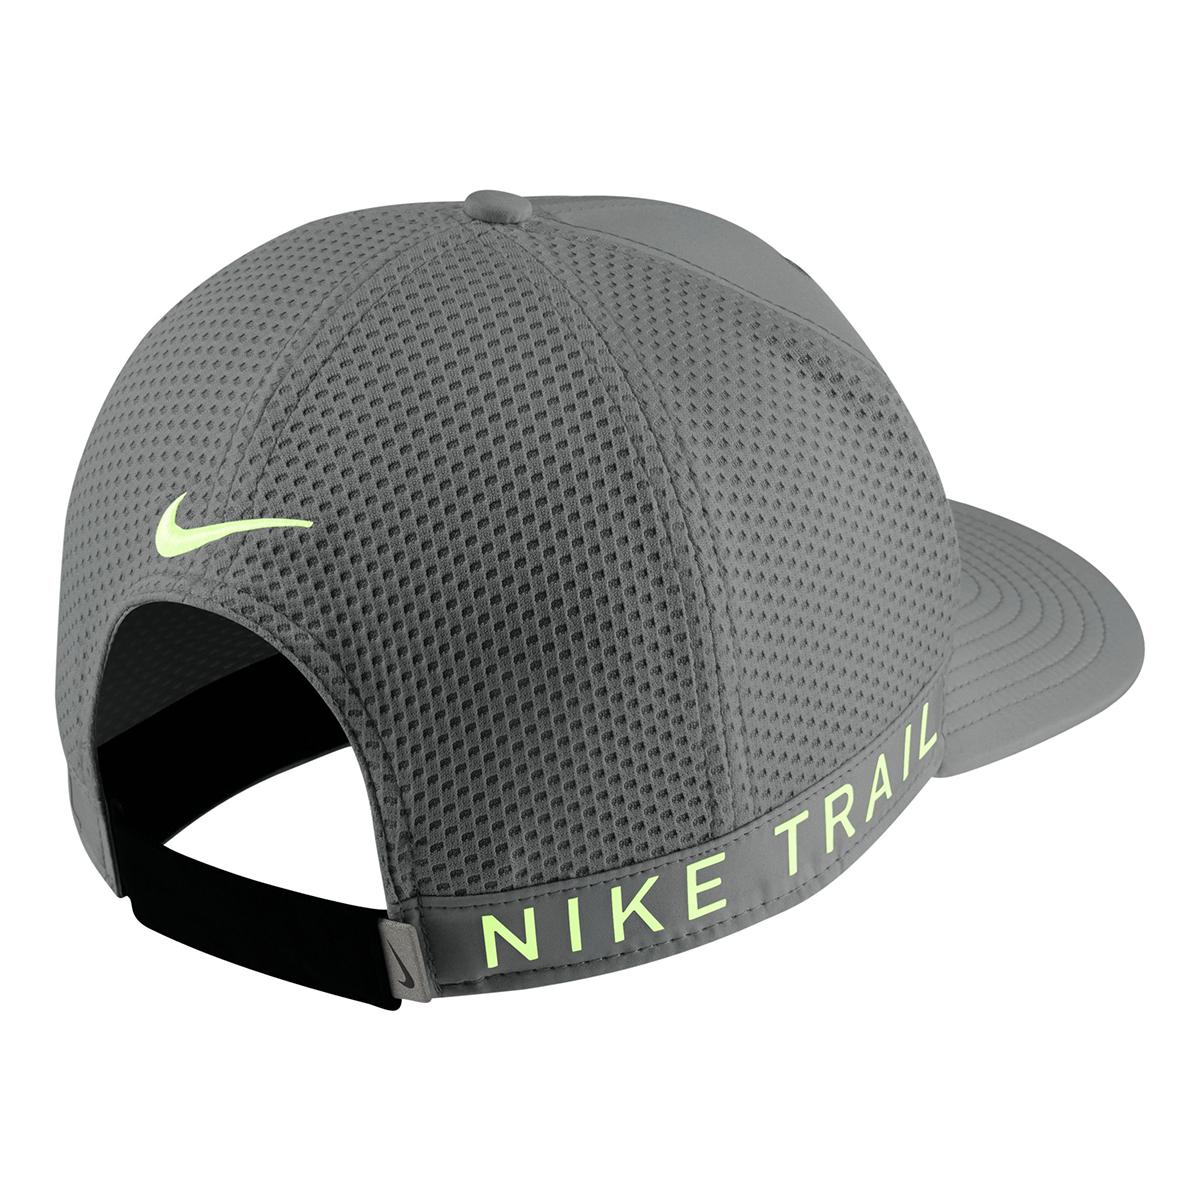 Nike Dri-FIT Pro Trail Cap - Color: Grey - Size: OS, Grey, large, image 2